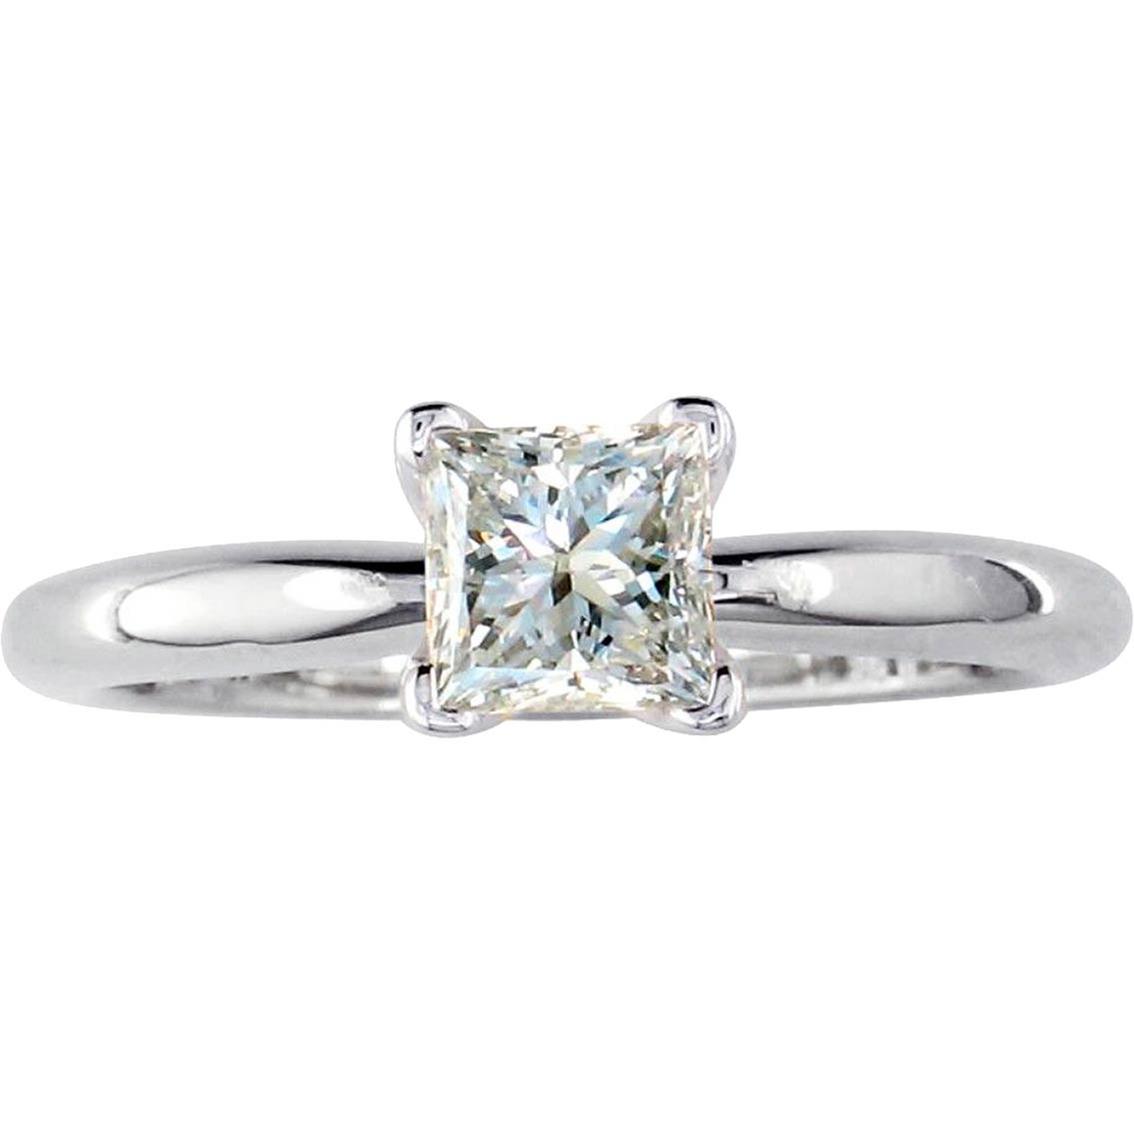 14k white gold 1 ct princess cut diamond solitaire ring. Black Bedroom Furniture Sets. Home Design Ideas